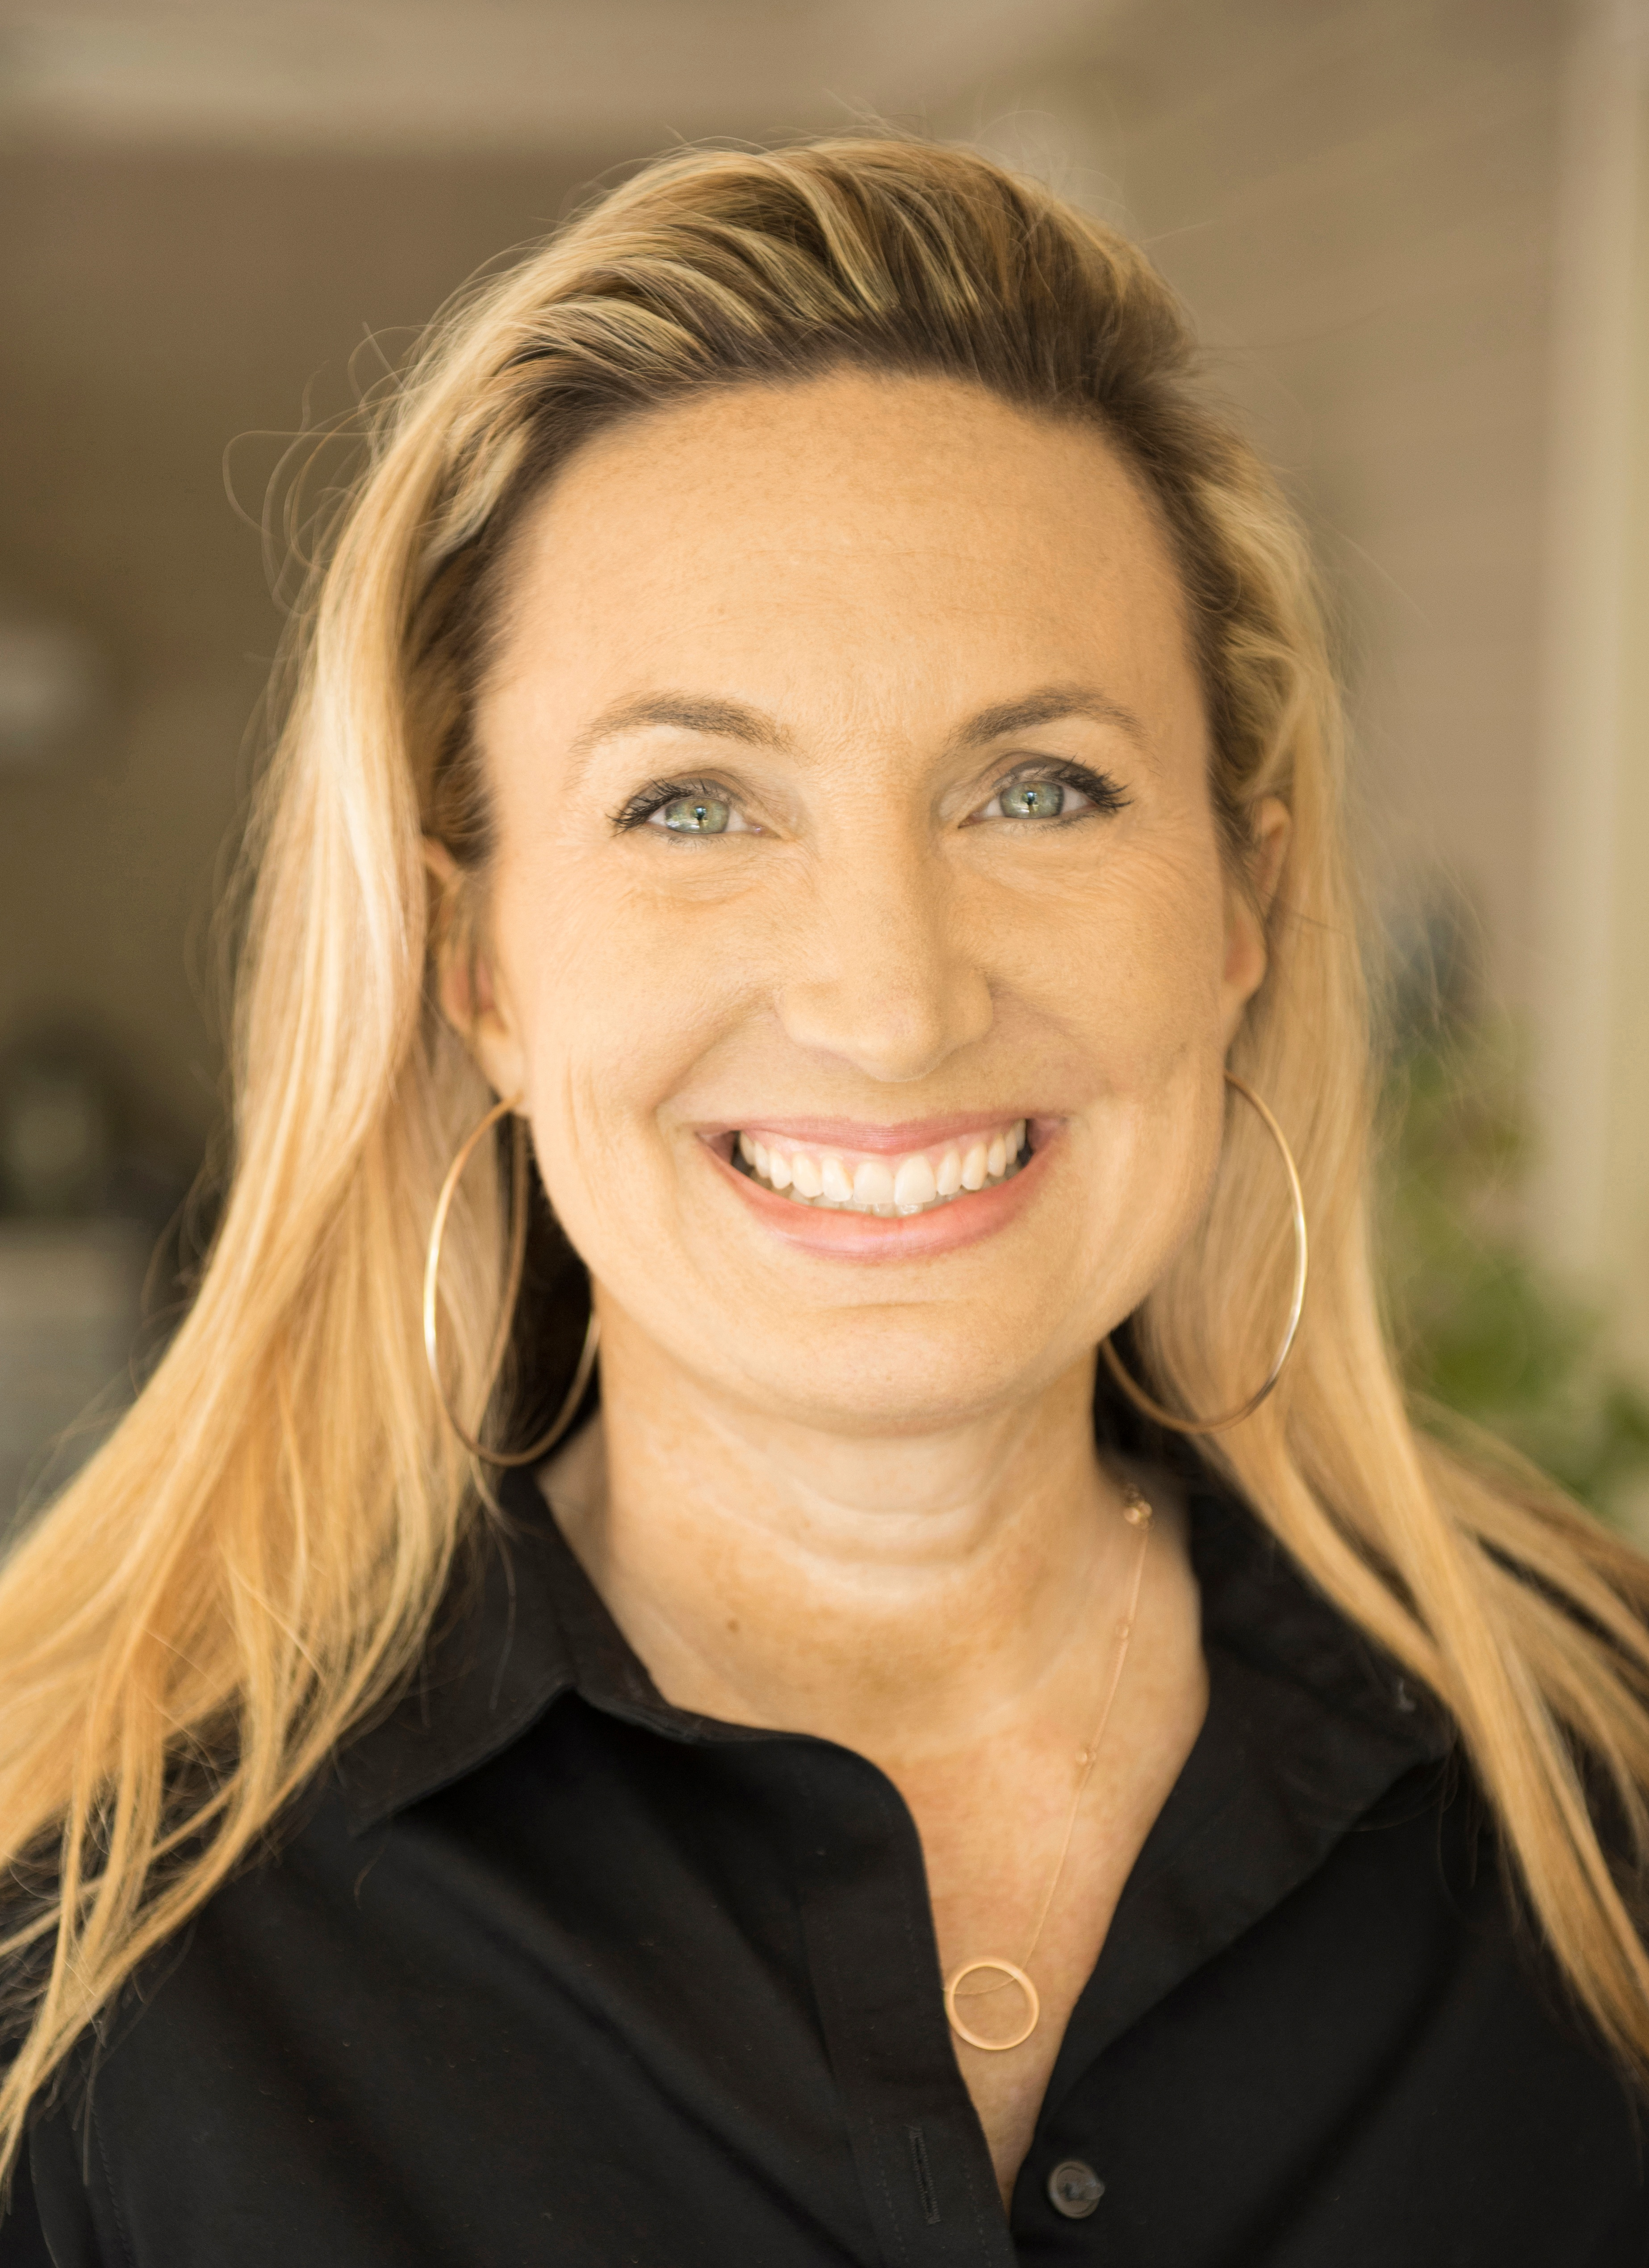 Laura Redmond